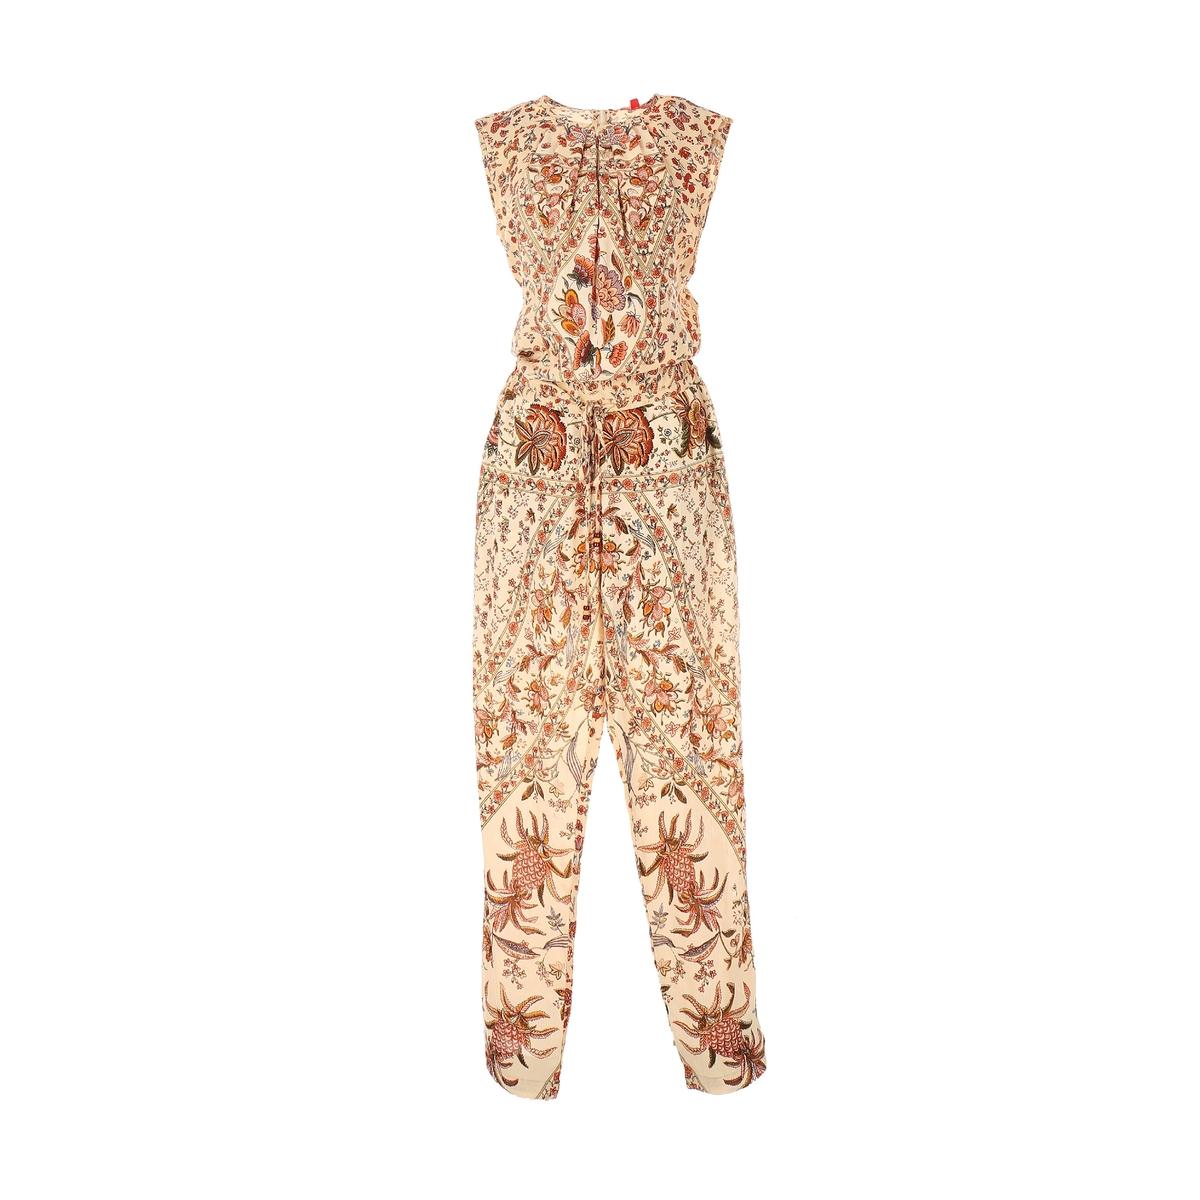 Комбинезон с брюками с рисункомМатериал : 100% вискоза Покрой комбинезона : комбинезон  Тип комбинезона : комбинезон с брюками<br><br>Цвет: рисунок бежевый